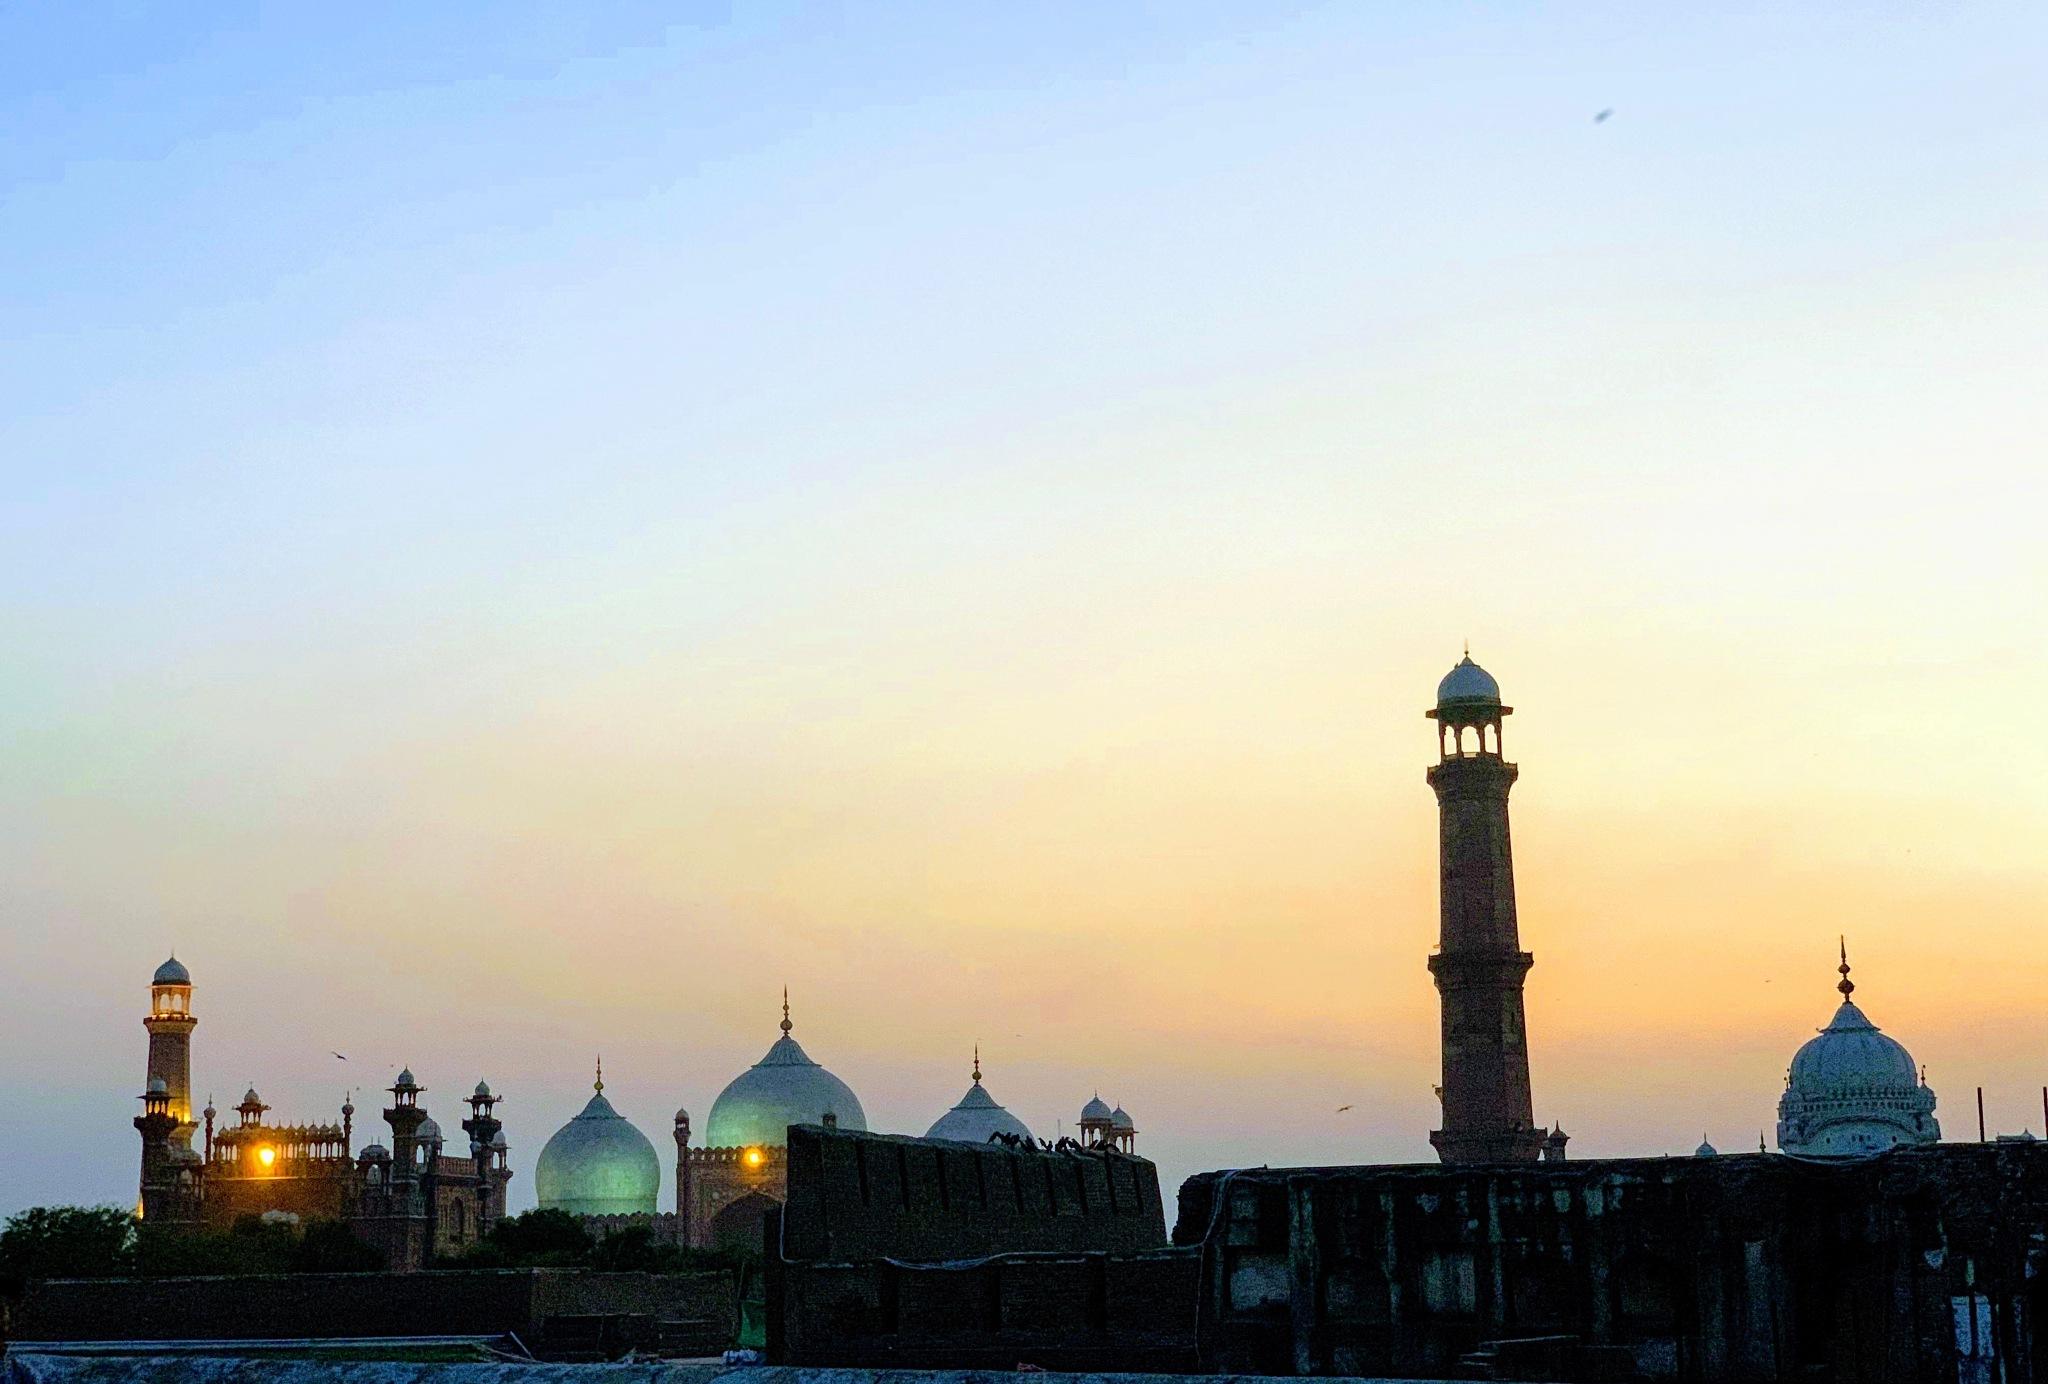 Badshahi Mosque by AmbReeN